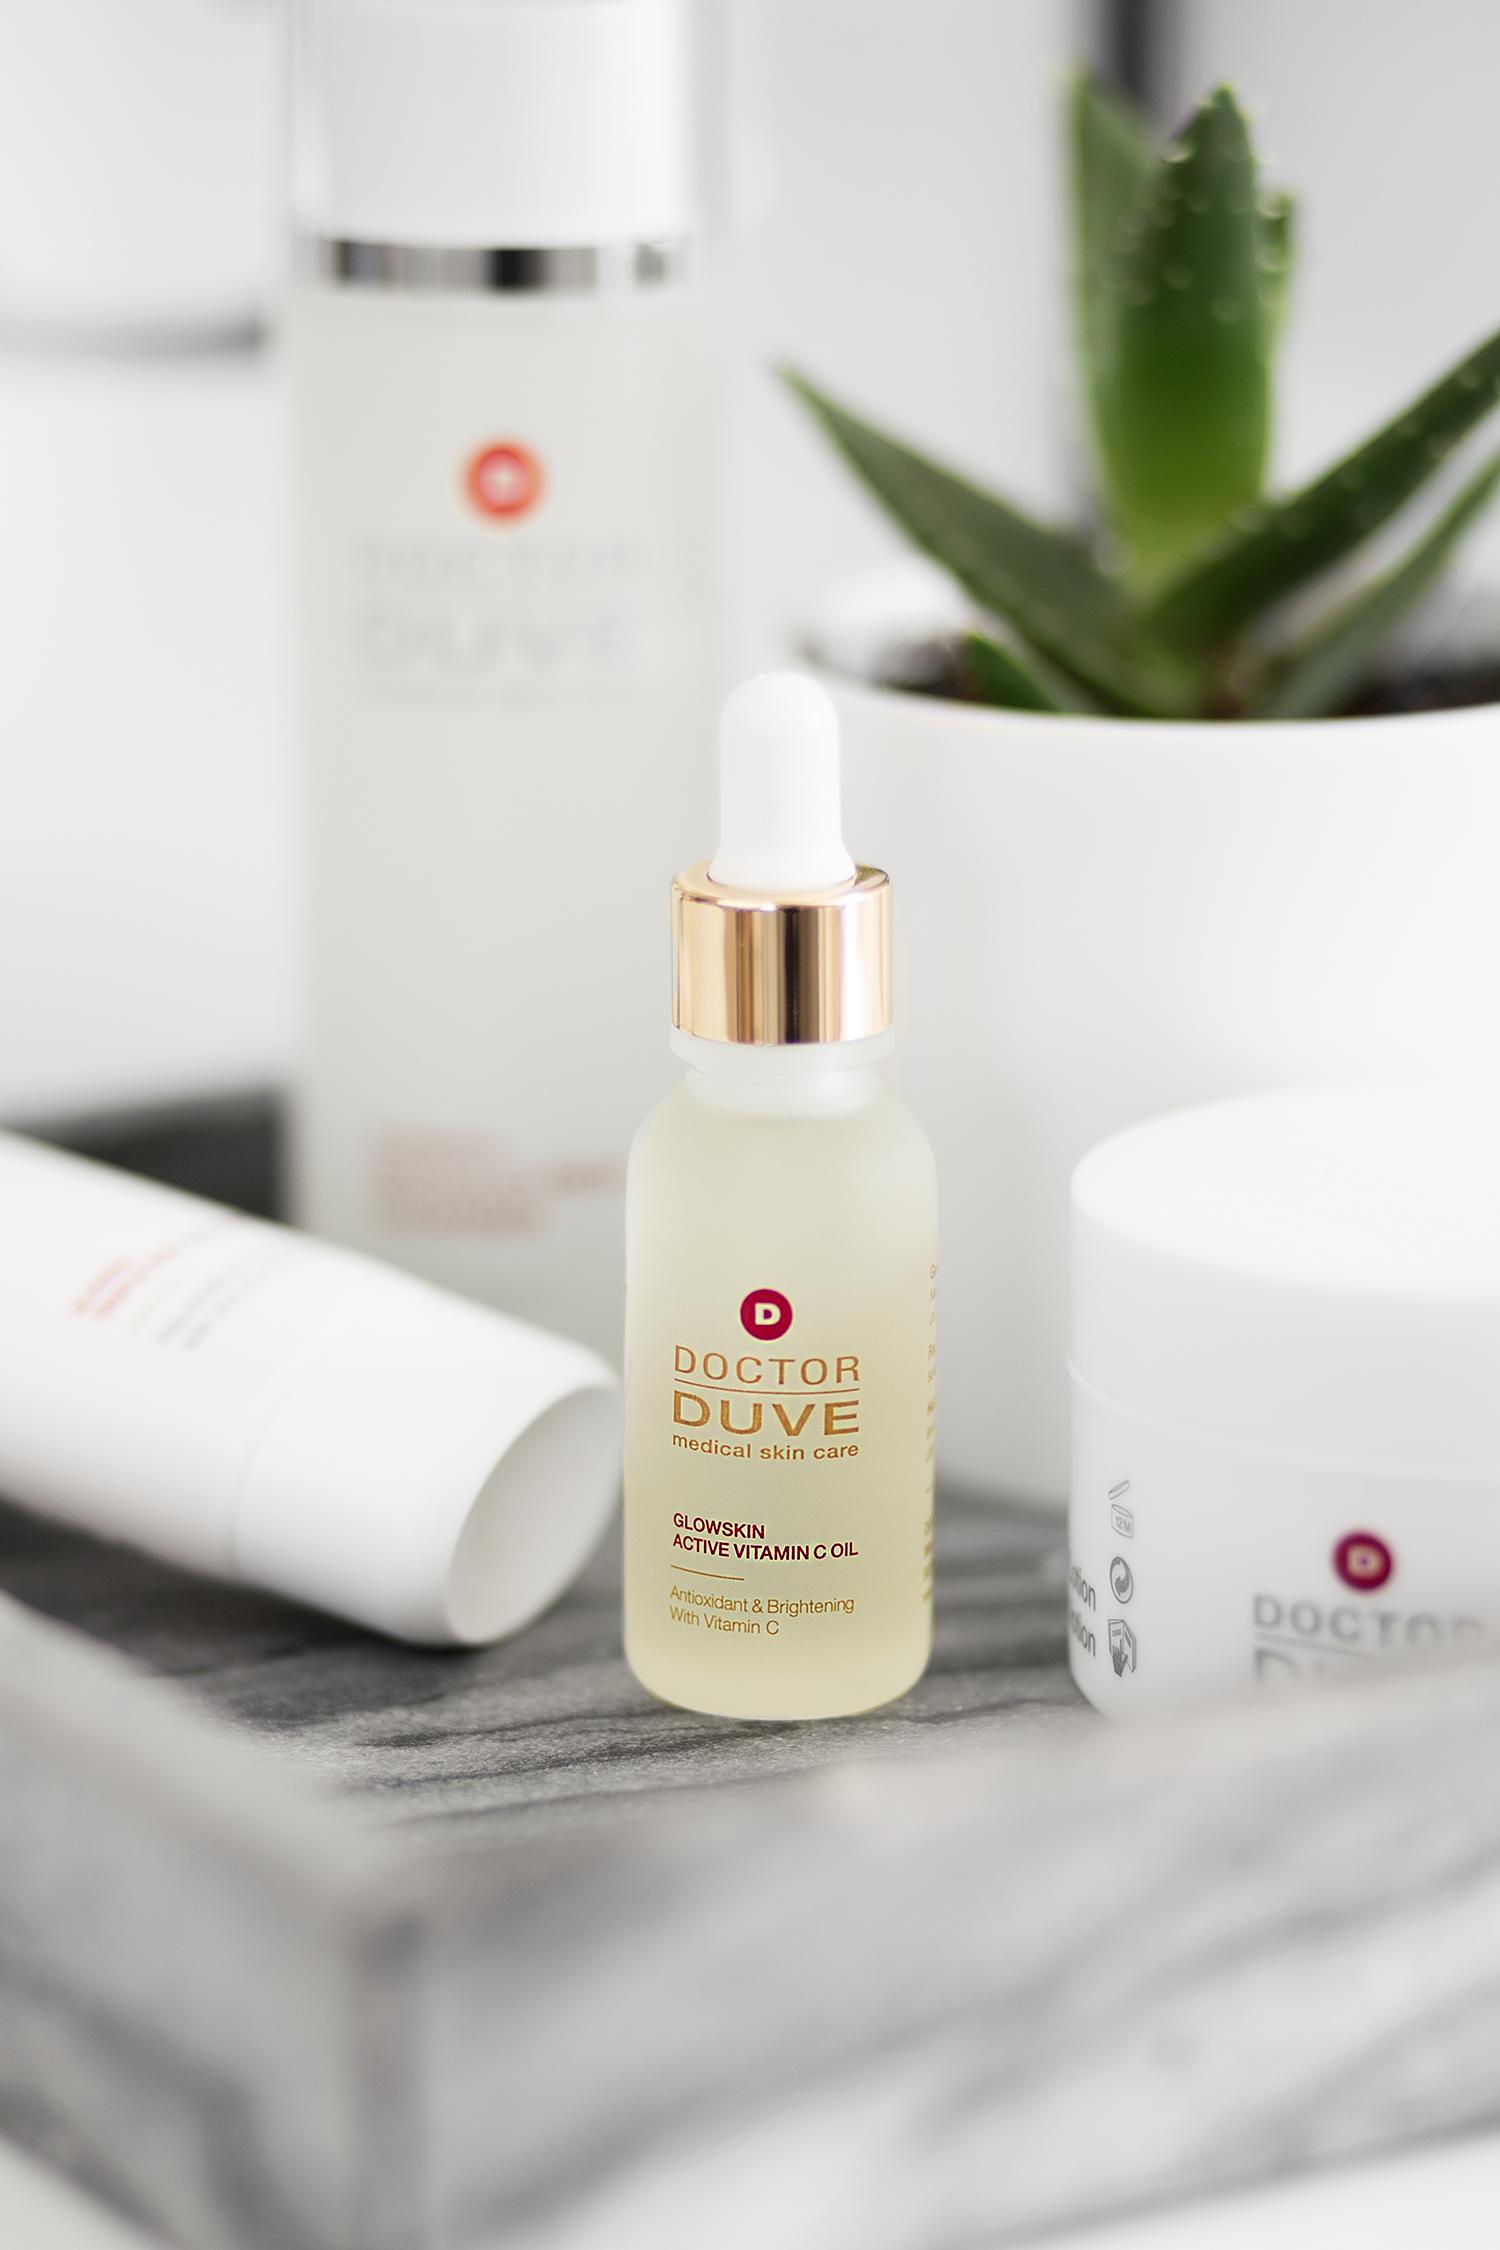 Erfahrungen mit Doctor Dave medical skincare, Glowskin Active Vitamin C Oil Test, Beauty Review, bezauberndenana.de